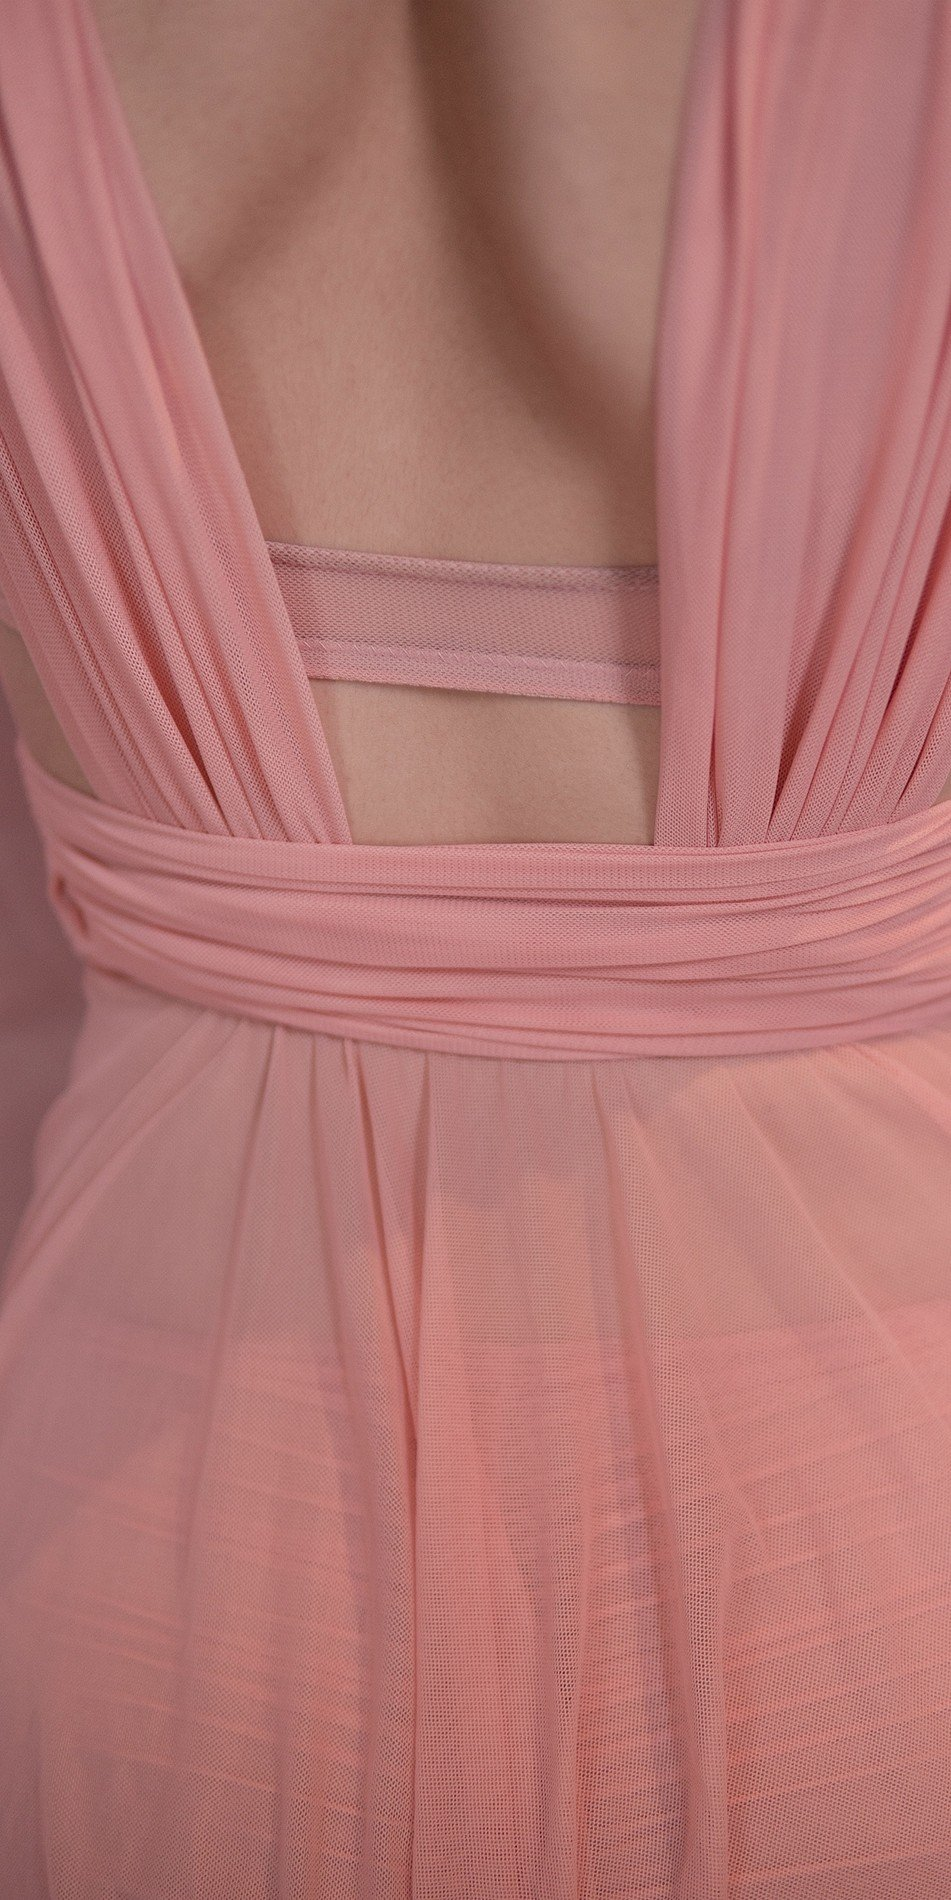 GRES draped20wrap20dress blush 5 r 2